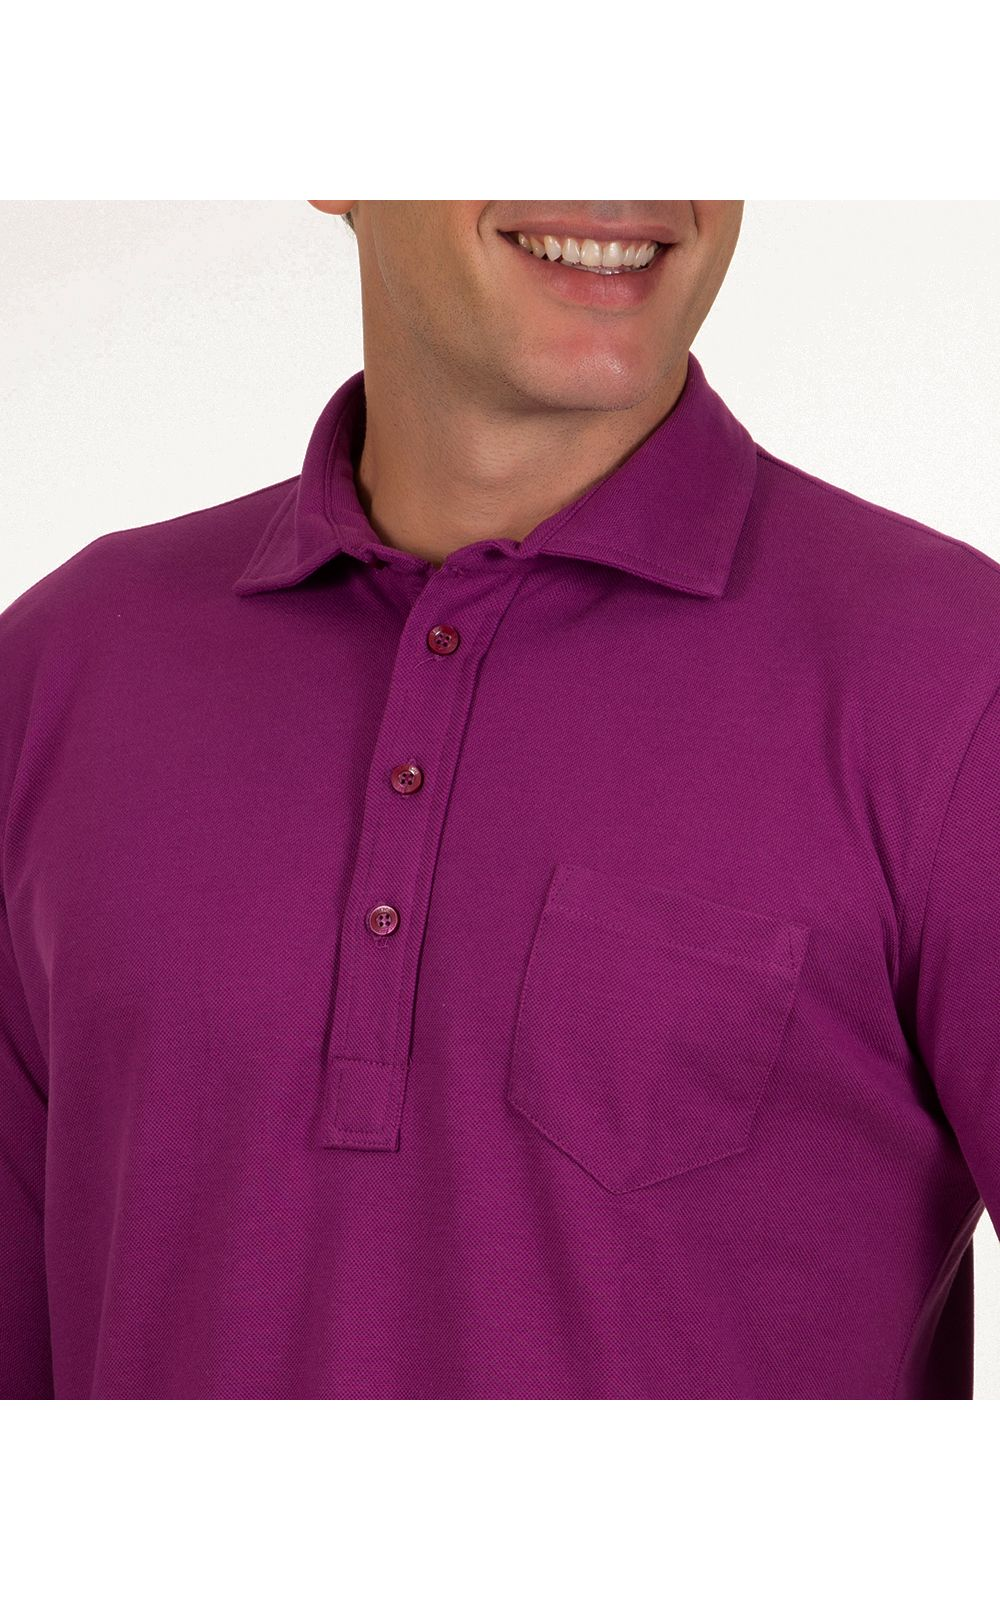 9764780891 ... Foto 3 - Camisa Polo Masculina Roxo Lisa